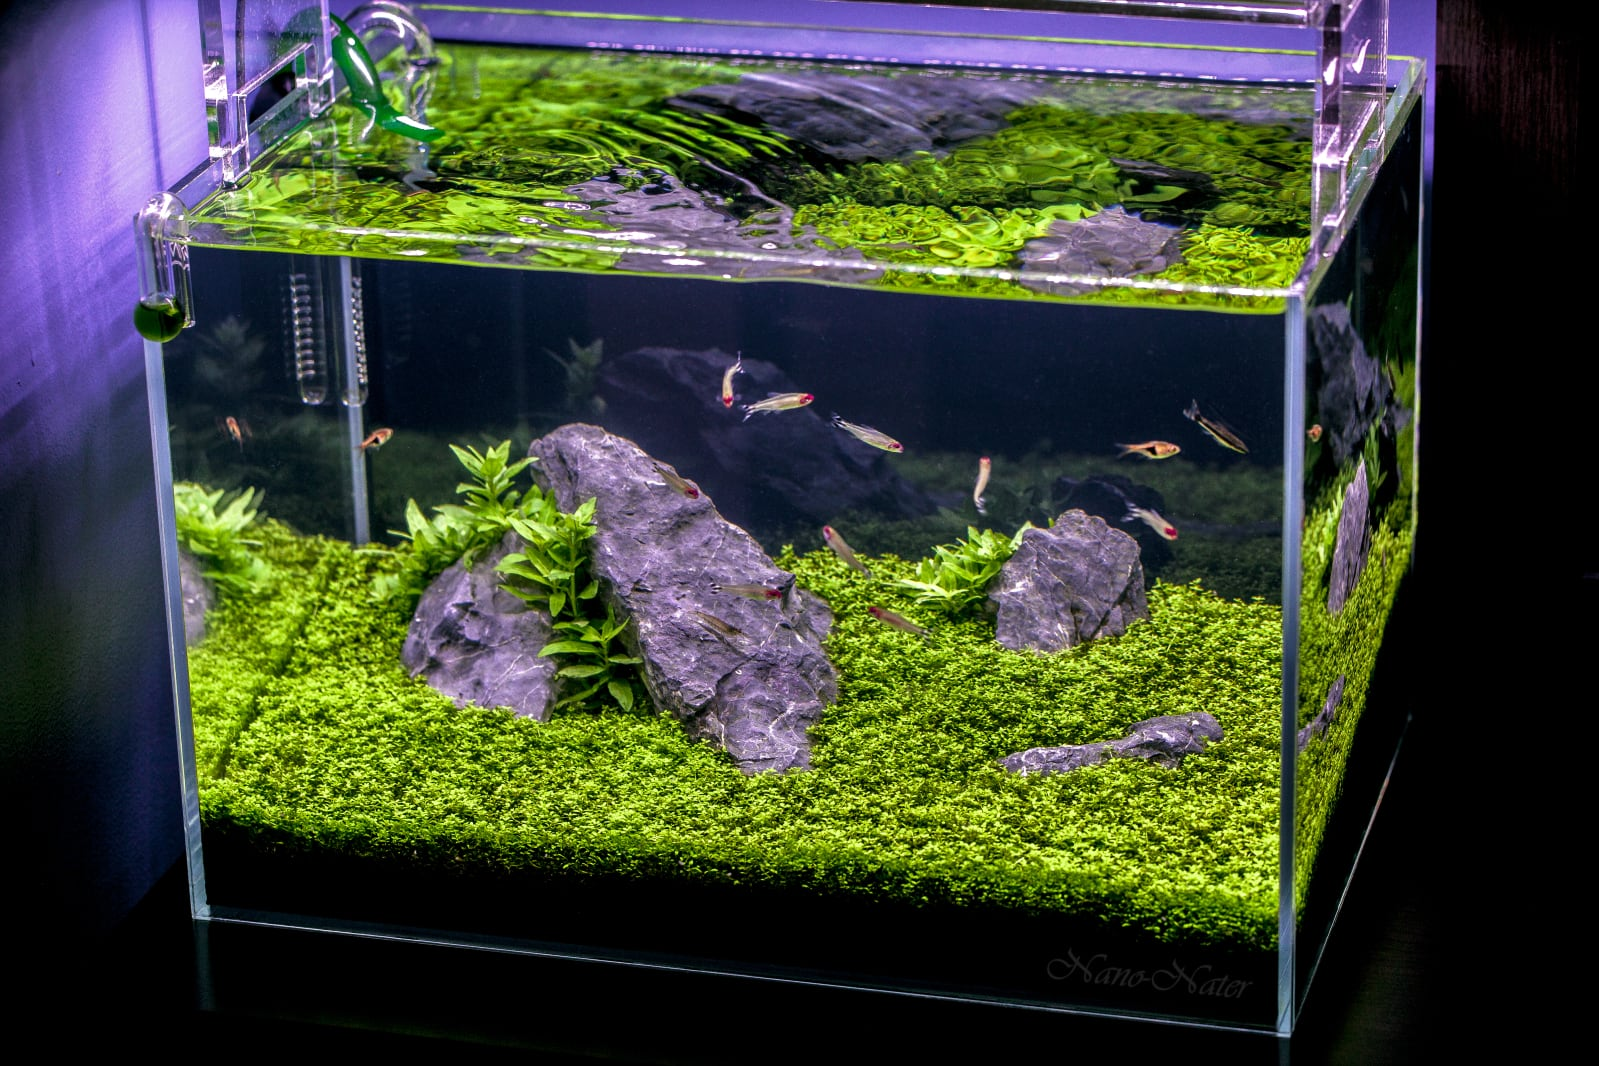 Hemianthus Callitrichoides Hc Cuba Aquarium Plant An Aquascaper S Challenge Aquascaping Love